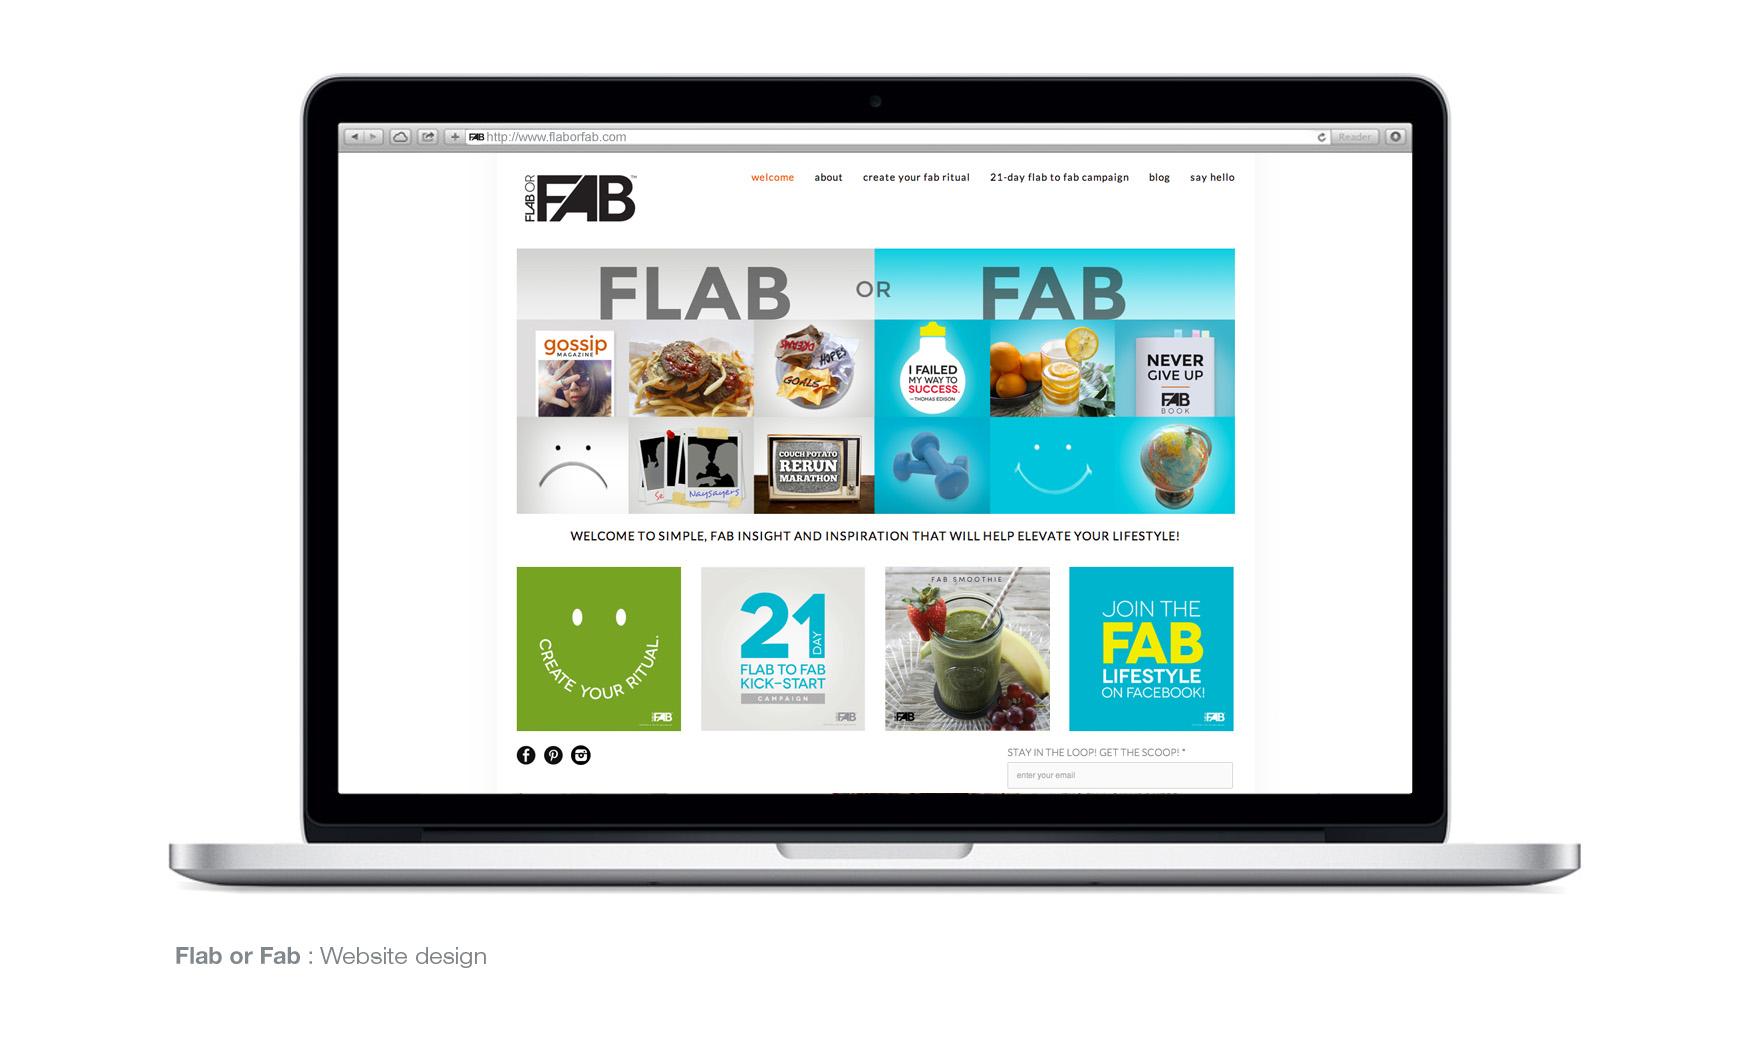 5.FF_Website3.jpg